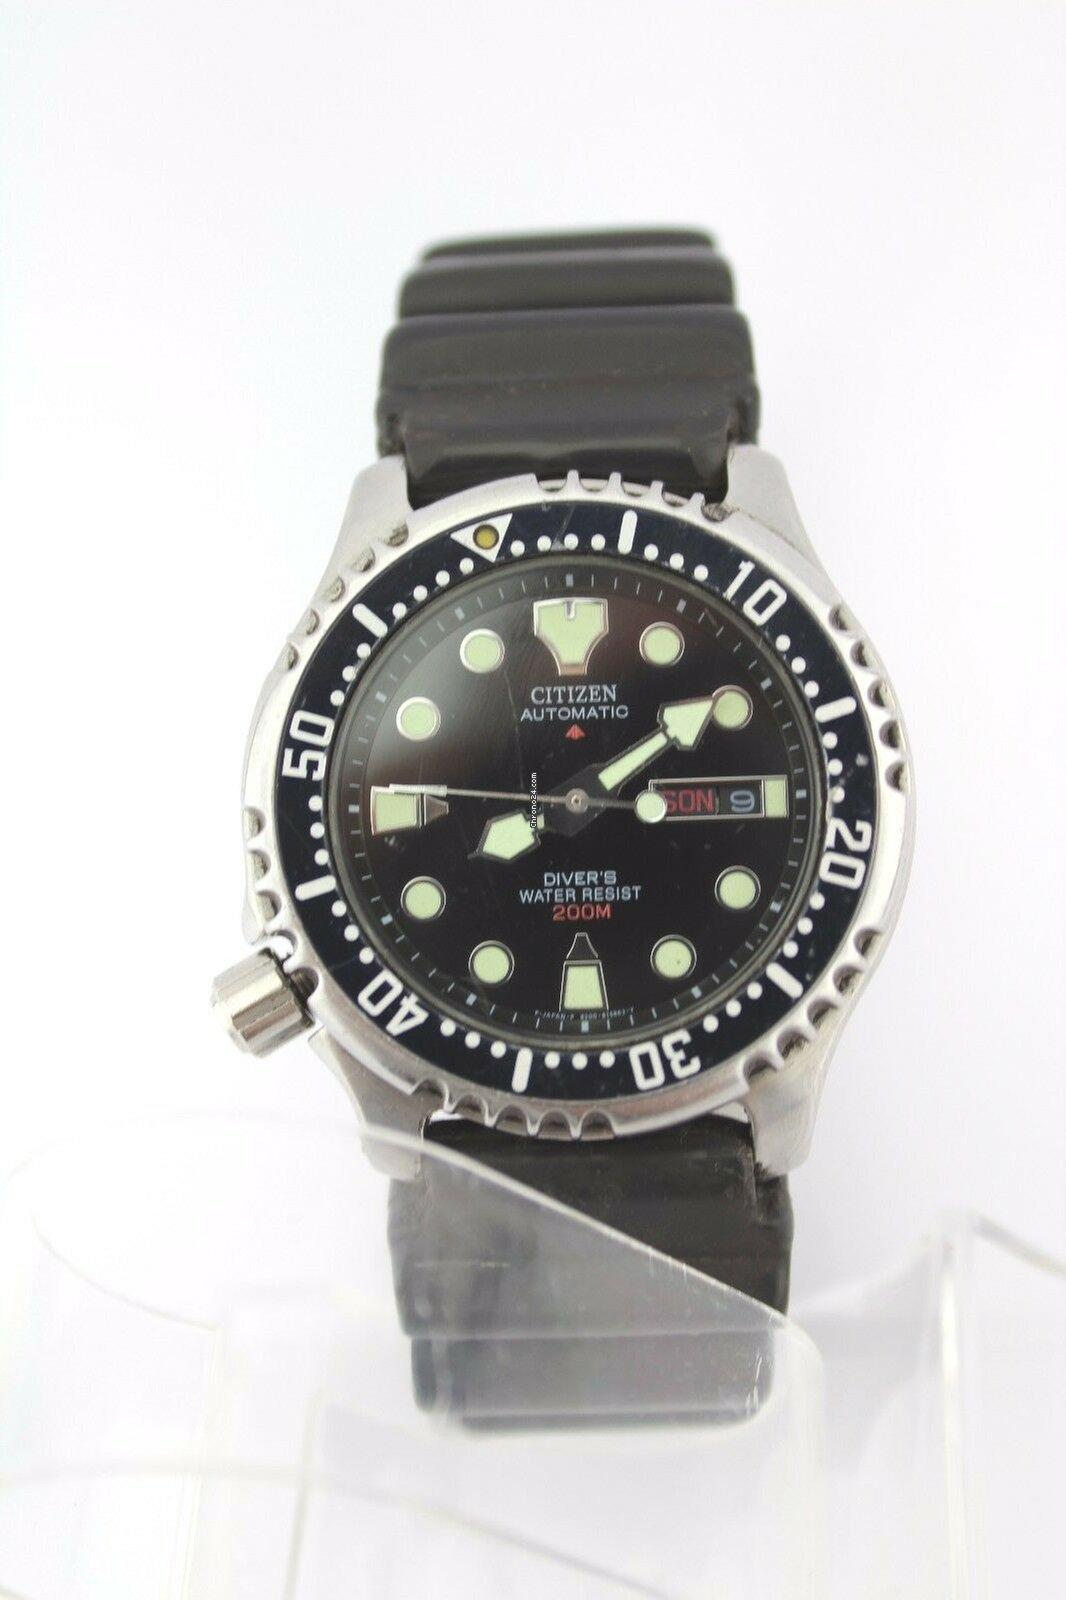 finest selection 471f8 1a6b5 Citizen Automatic Diver Cal.8203 a watch Uhr Armbanduhr ...